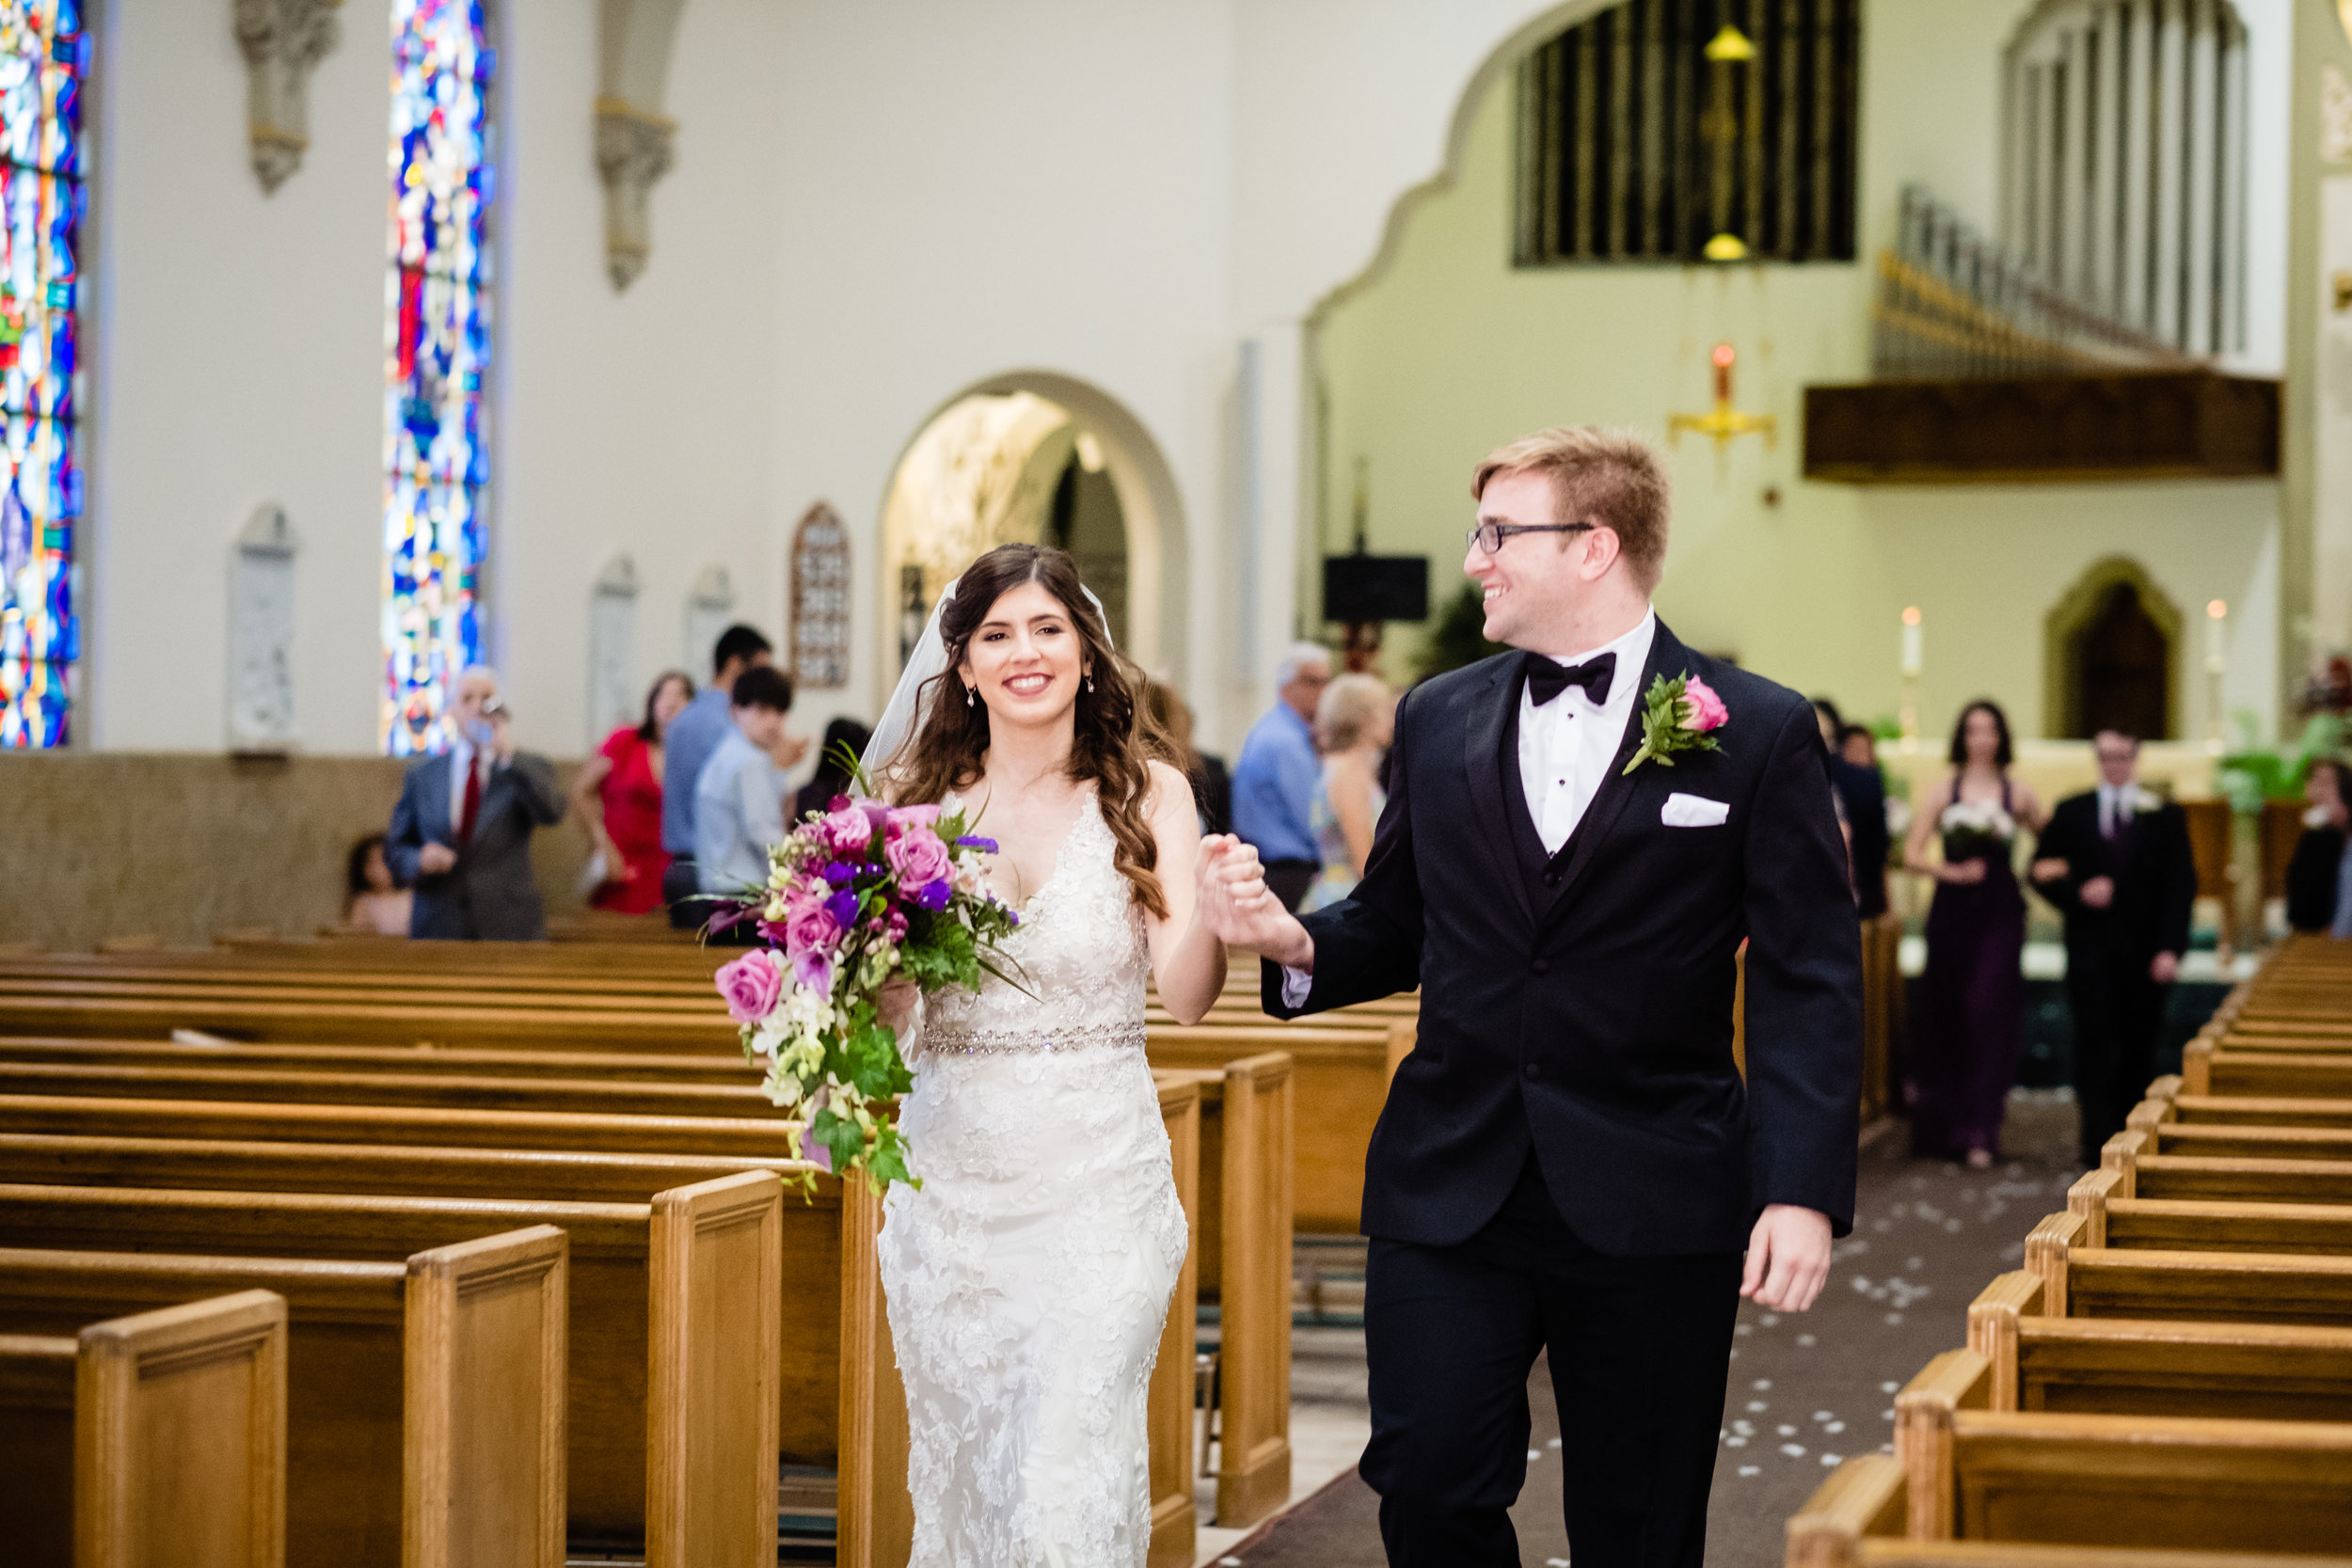 HAH_Zoe and Daniel_Clearwater Wedding_206_2018.jpg